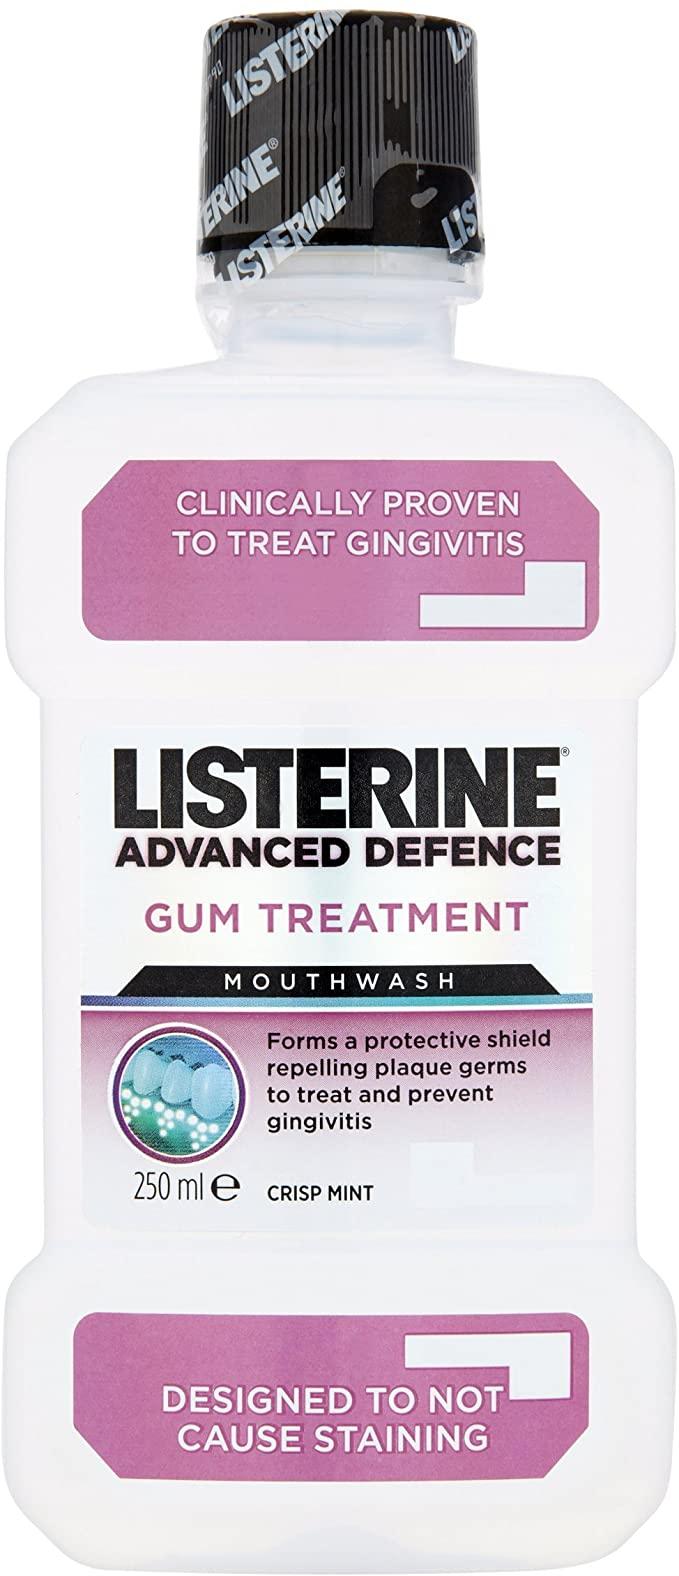 Listerine Advanced Defence Gum Treatment Mouthwash, Crisp Mint, 250 ml - £1 instore @ Home Bargains, Newcastle upon Tyne